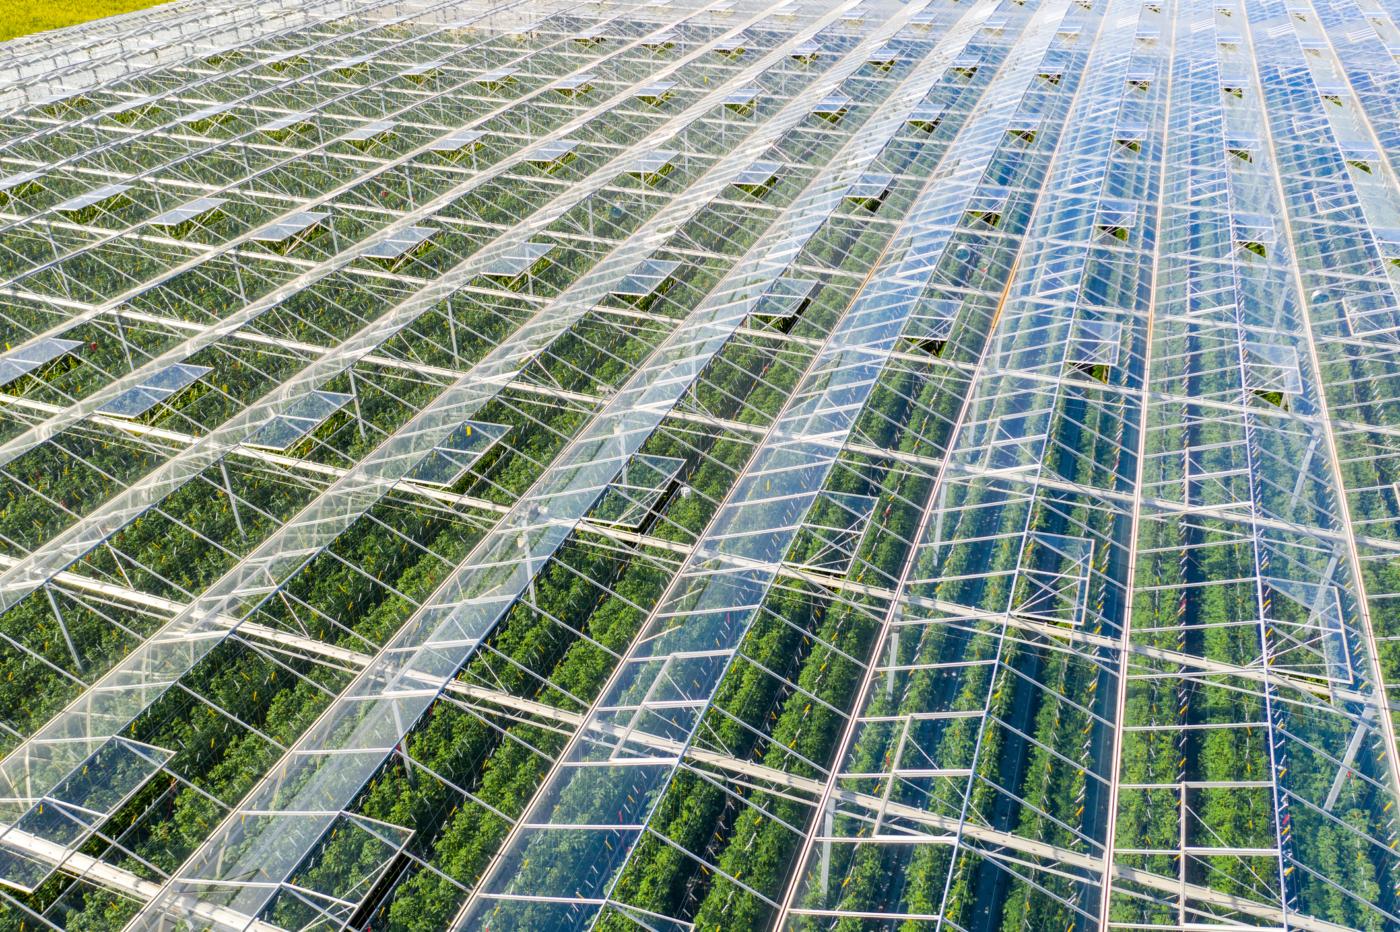 Hortiya – Indoor-Farming mit KI